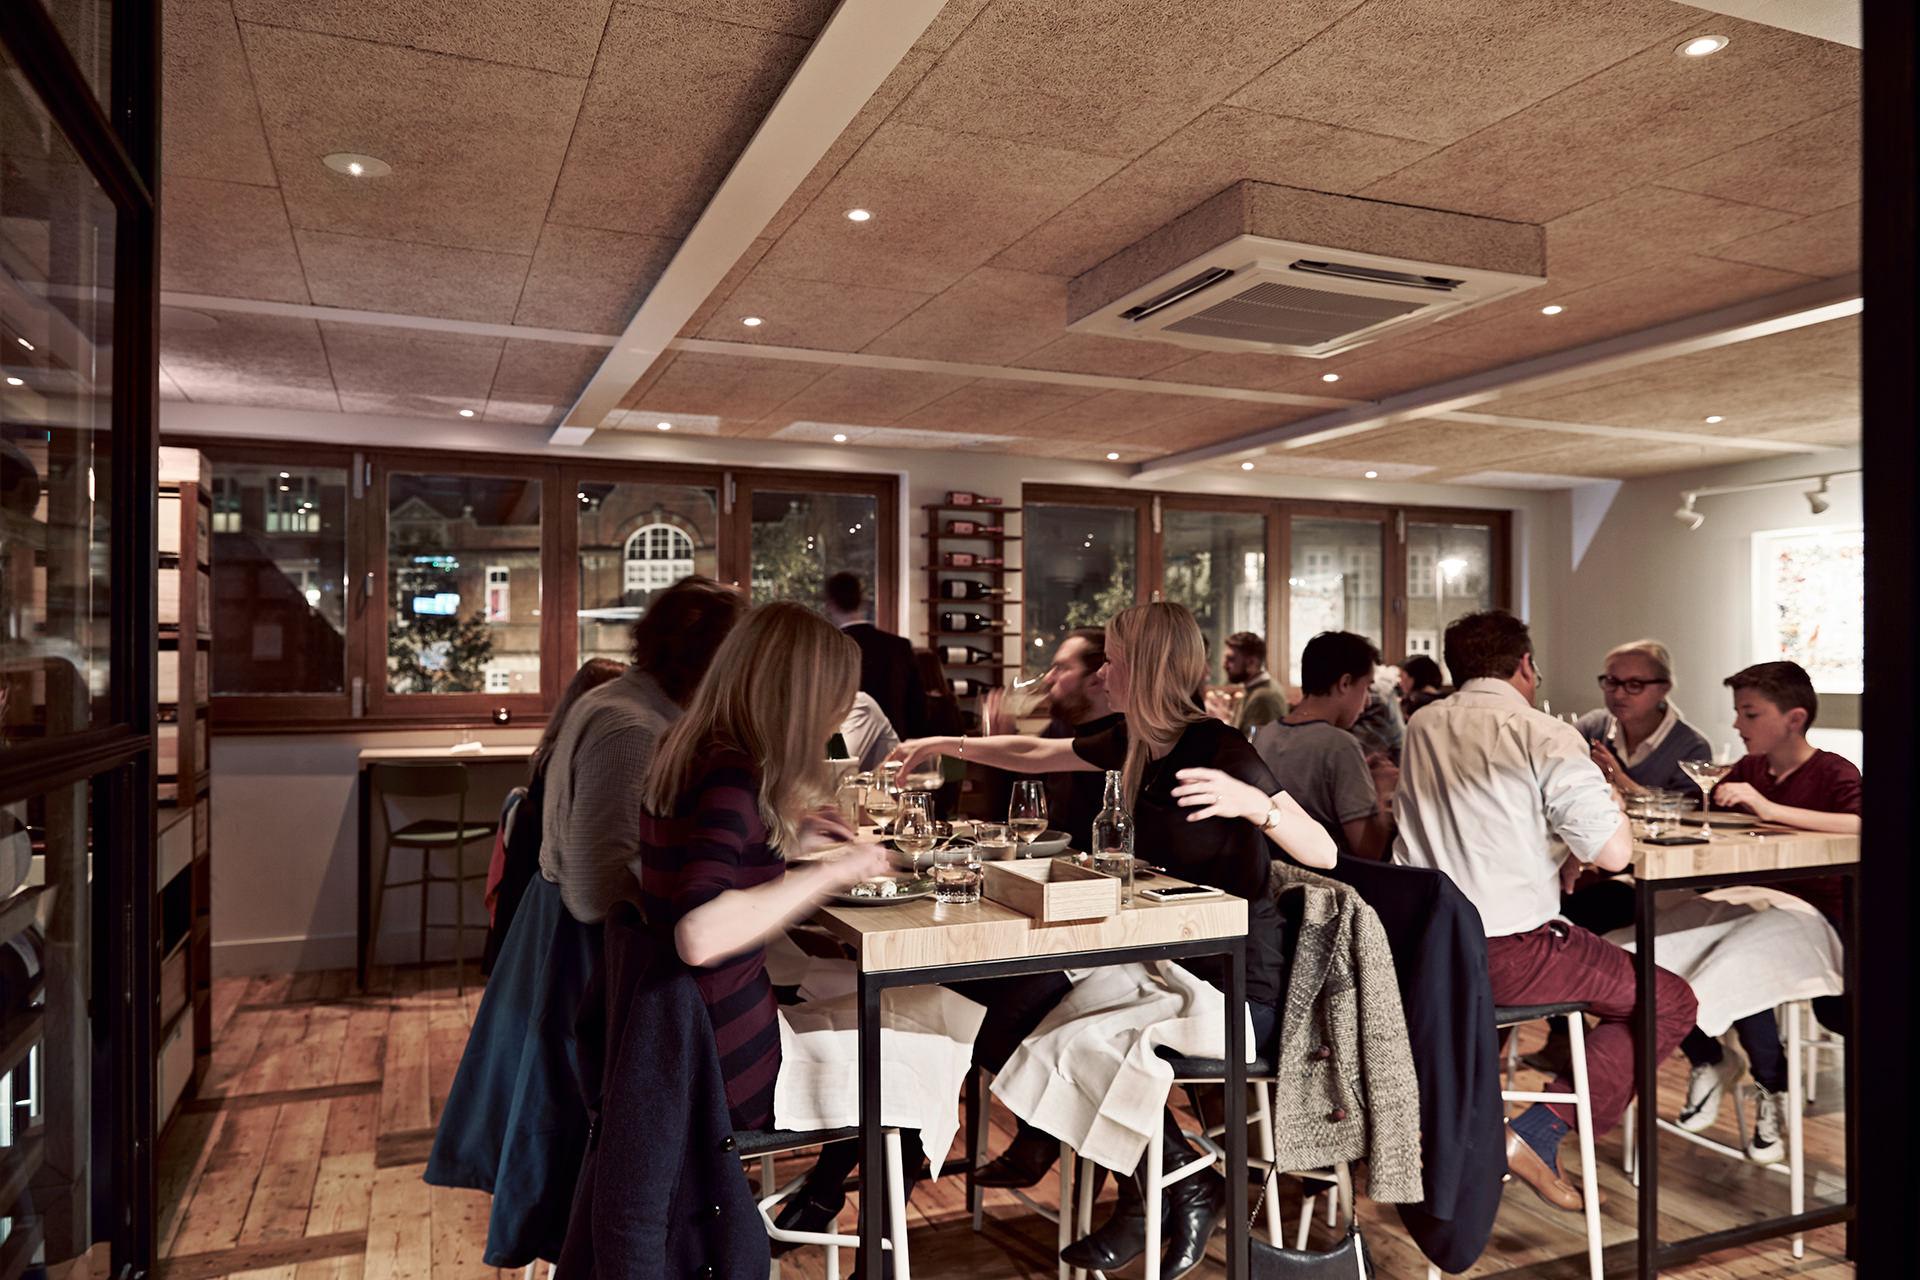 restaurant-london-upstairs-people-dinner